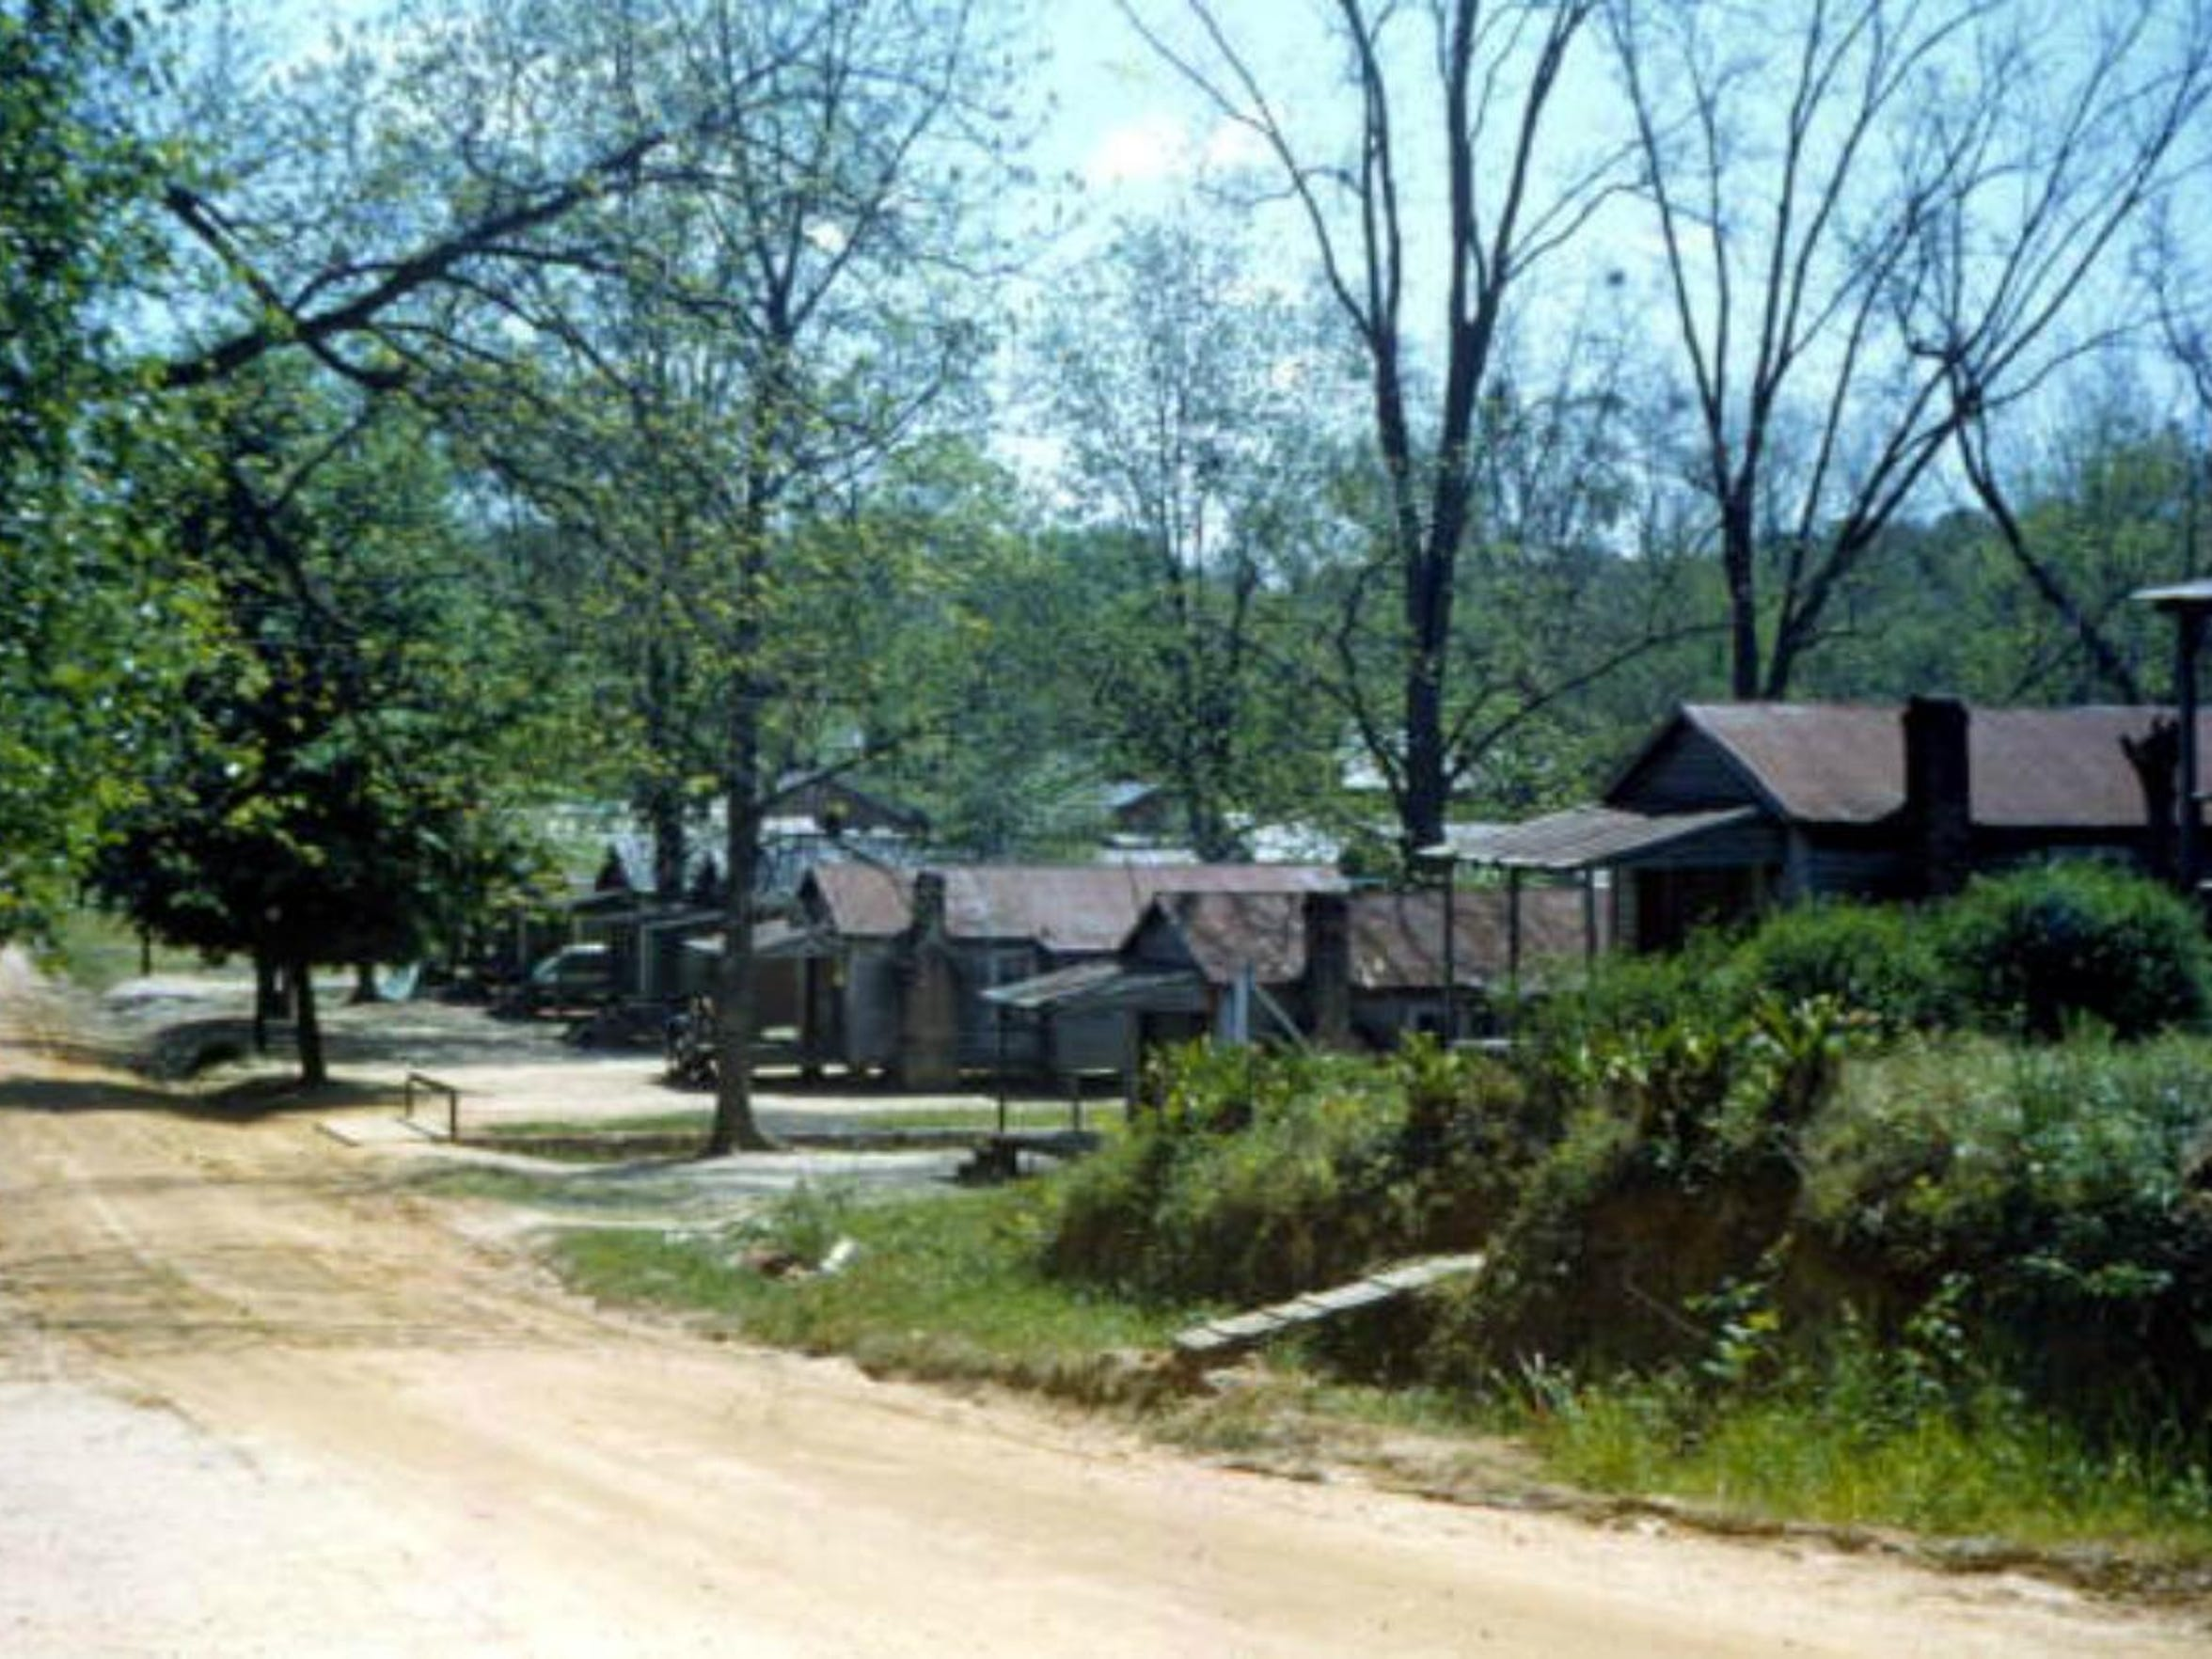 Smokey Hollow historic dirt